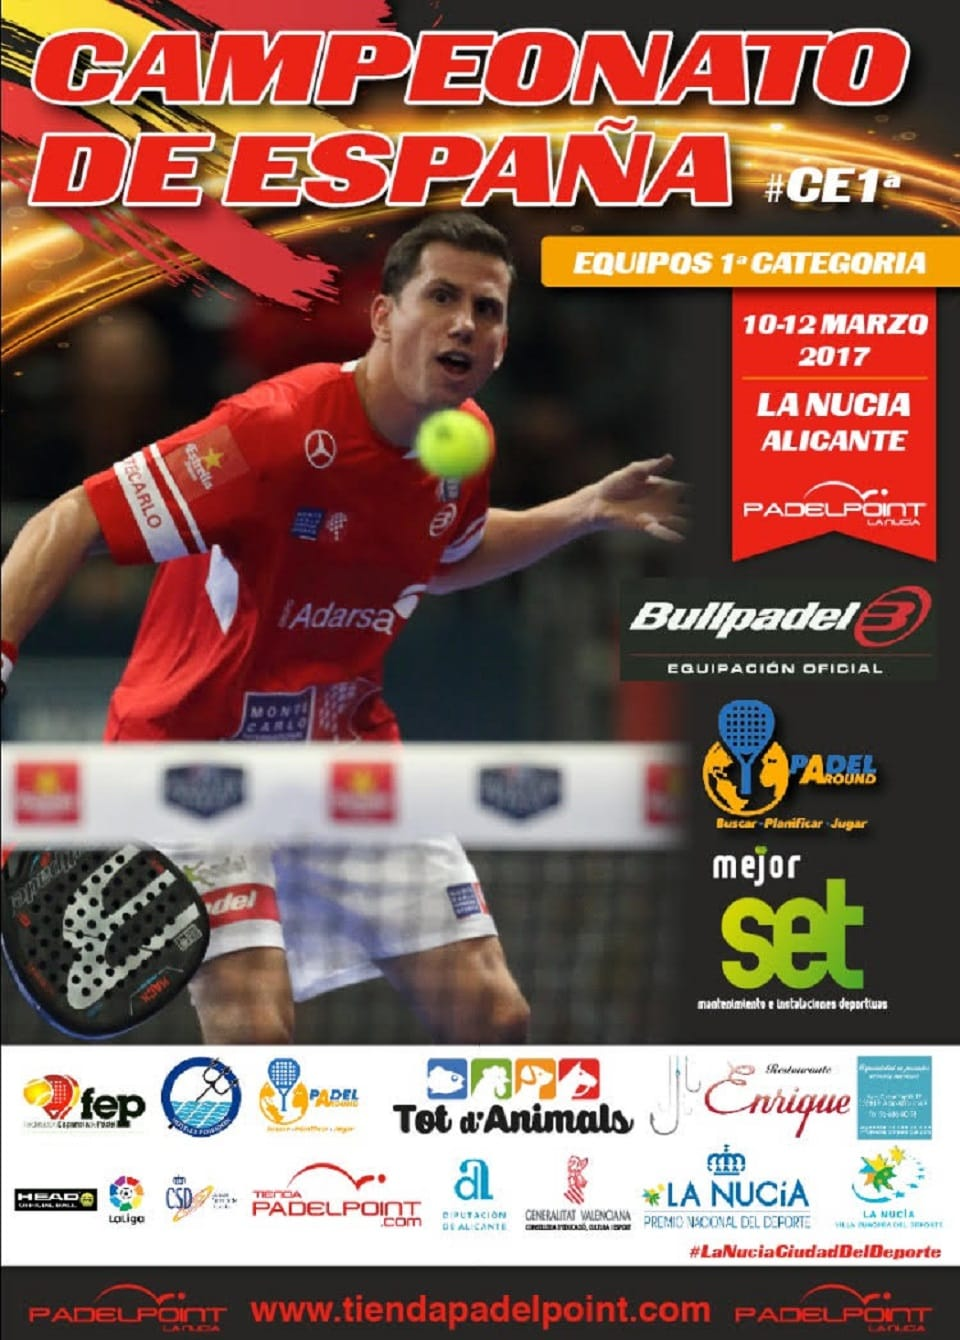 campeonato de españa XXXIII Campeonato de España por equipos de 1ª Categoría 2017